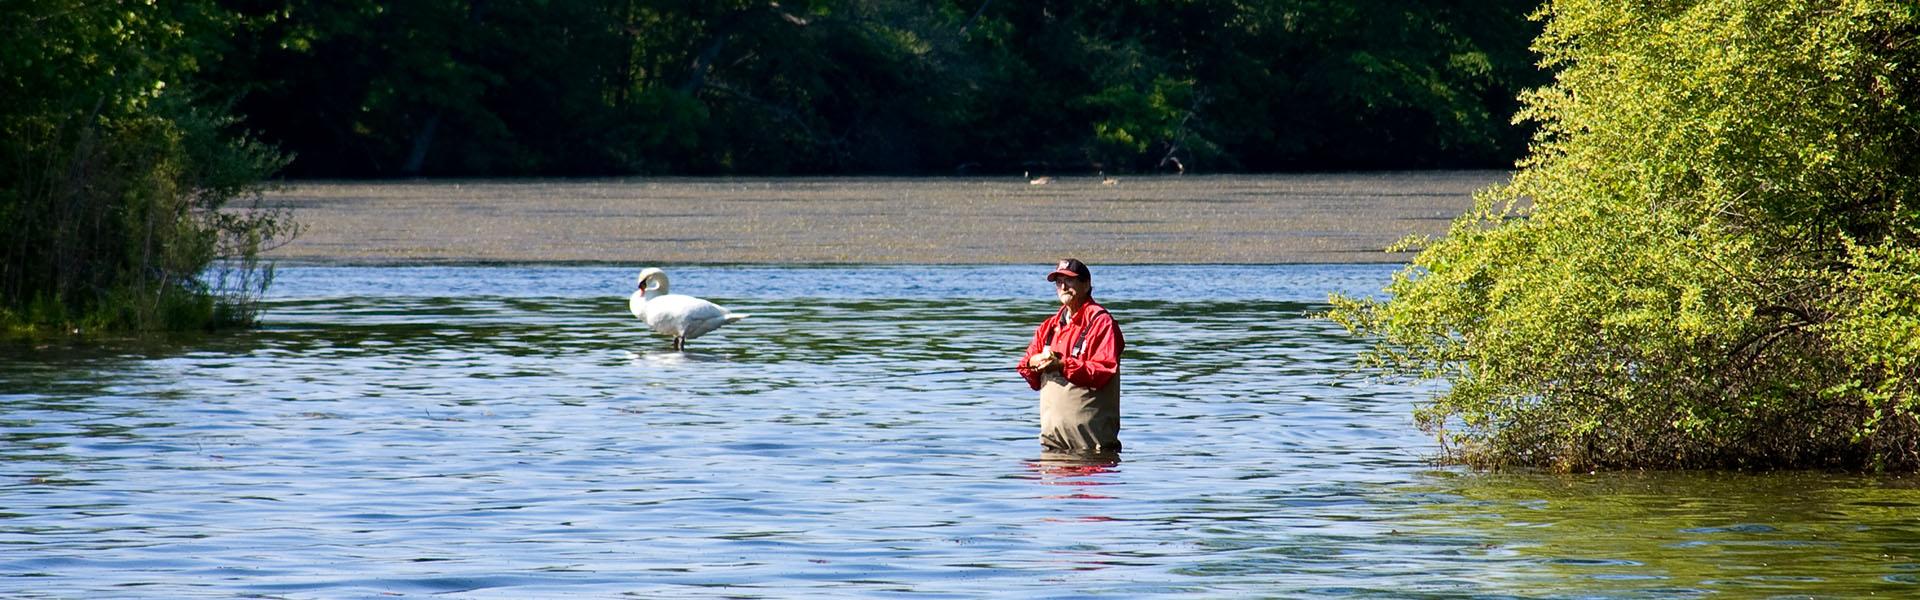 River Huron Mi Fishing Map